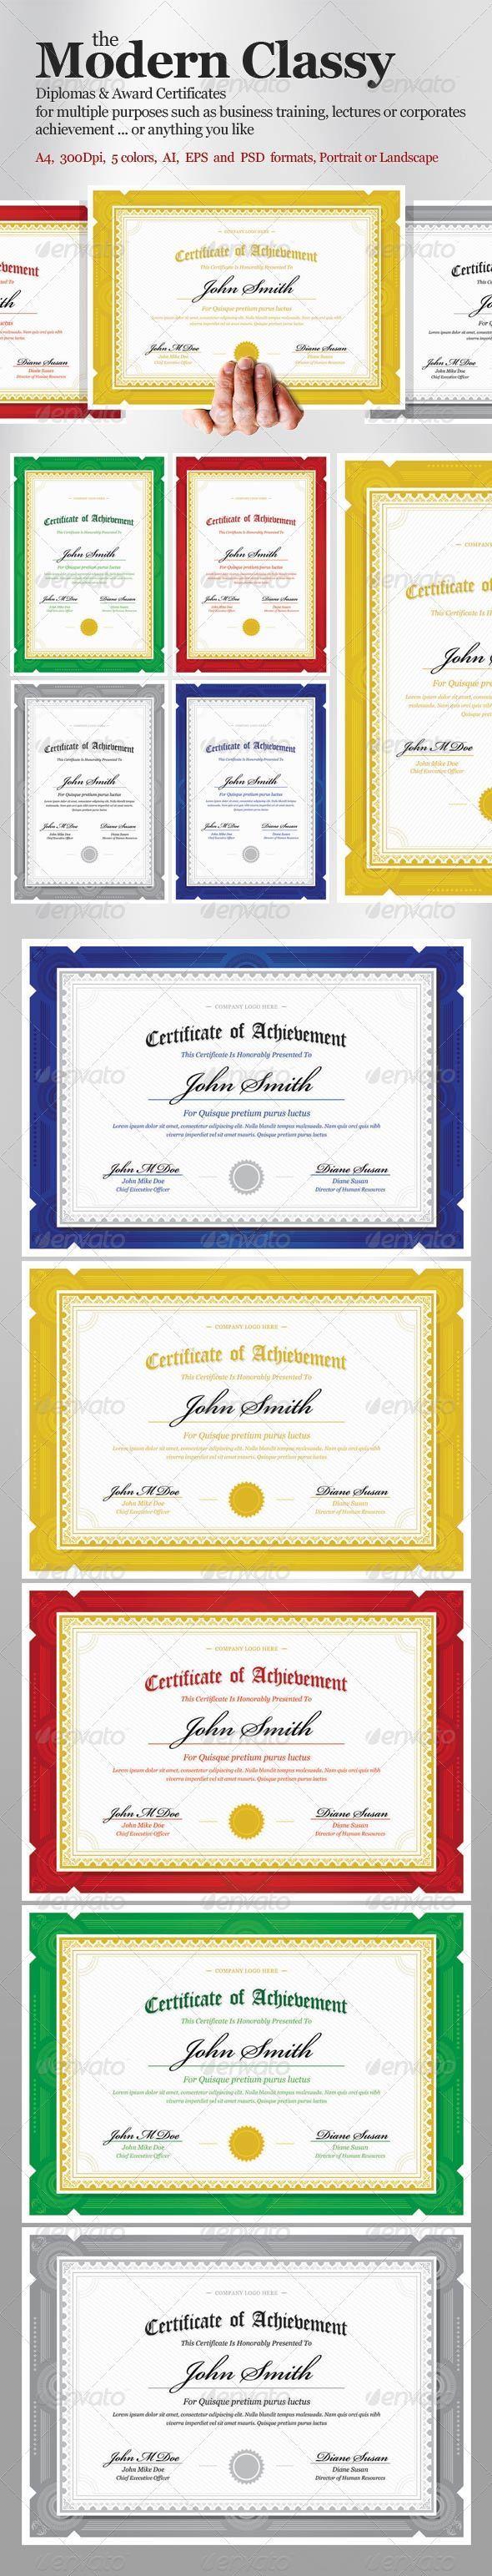 GraphicRiver Modern Classy diploma award Certificate 3403319